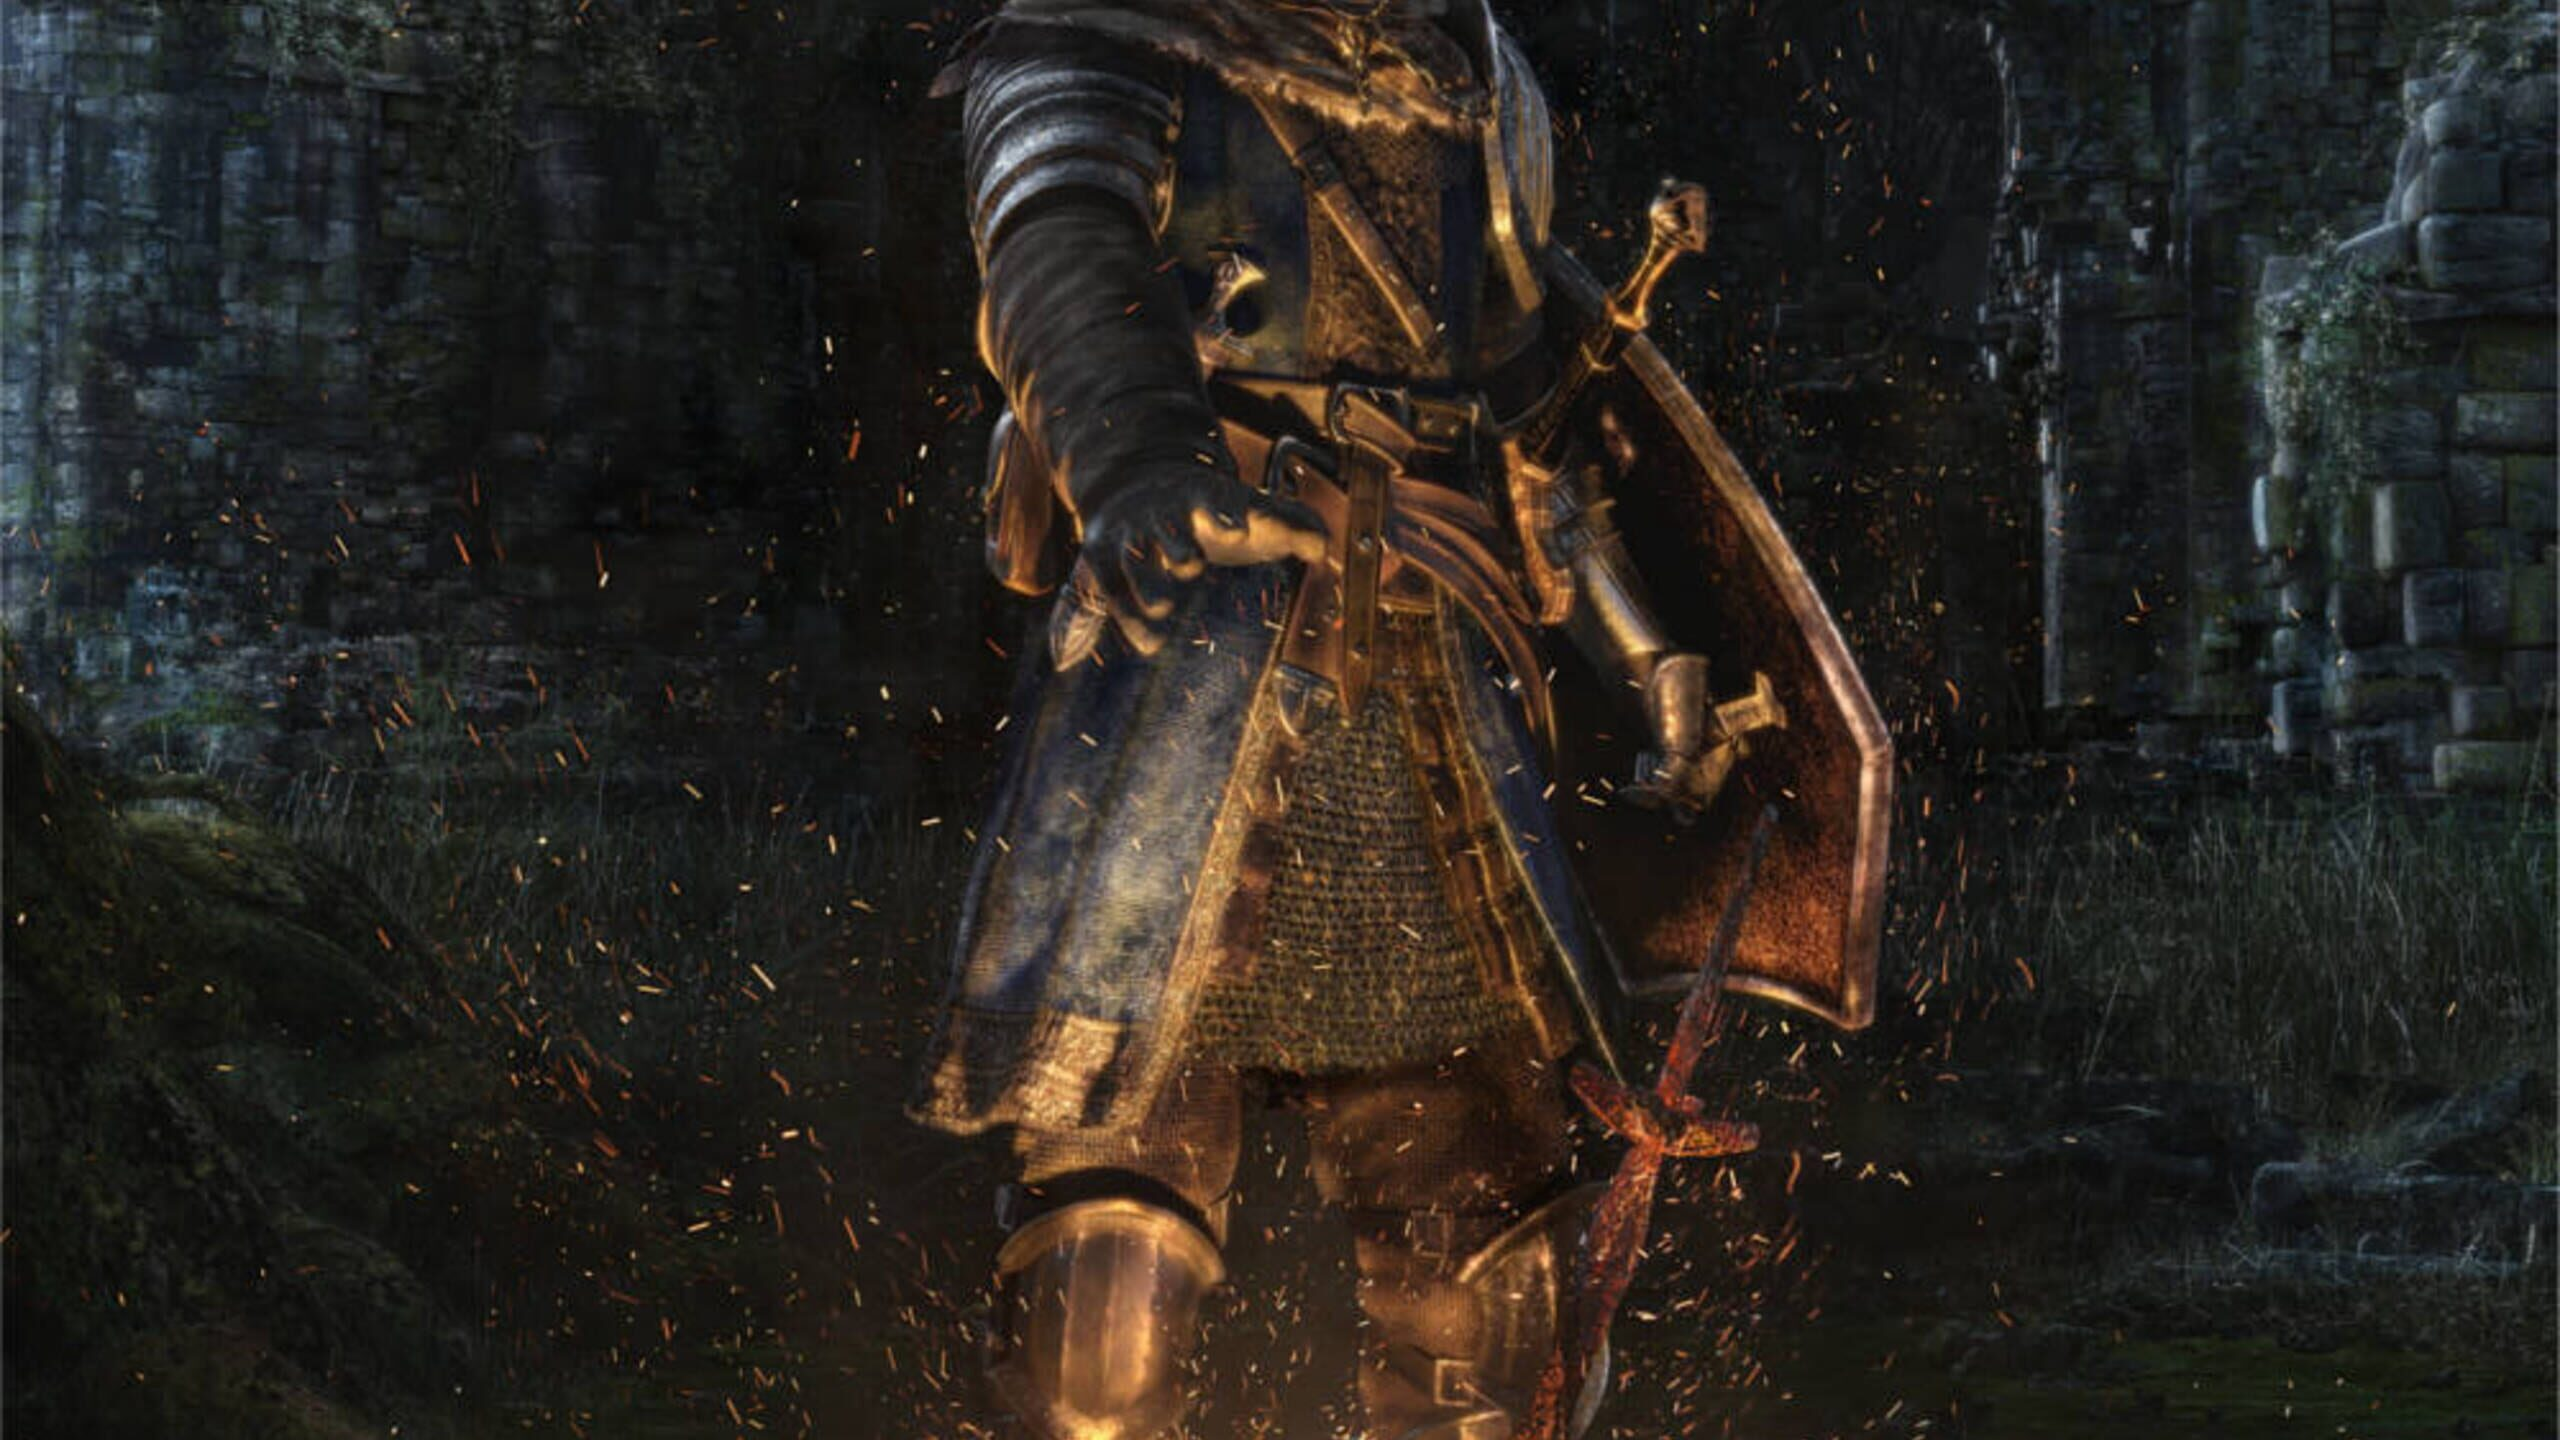 game cover art for Dark Souls: Remastered